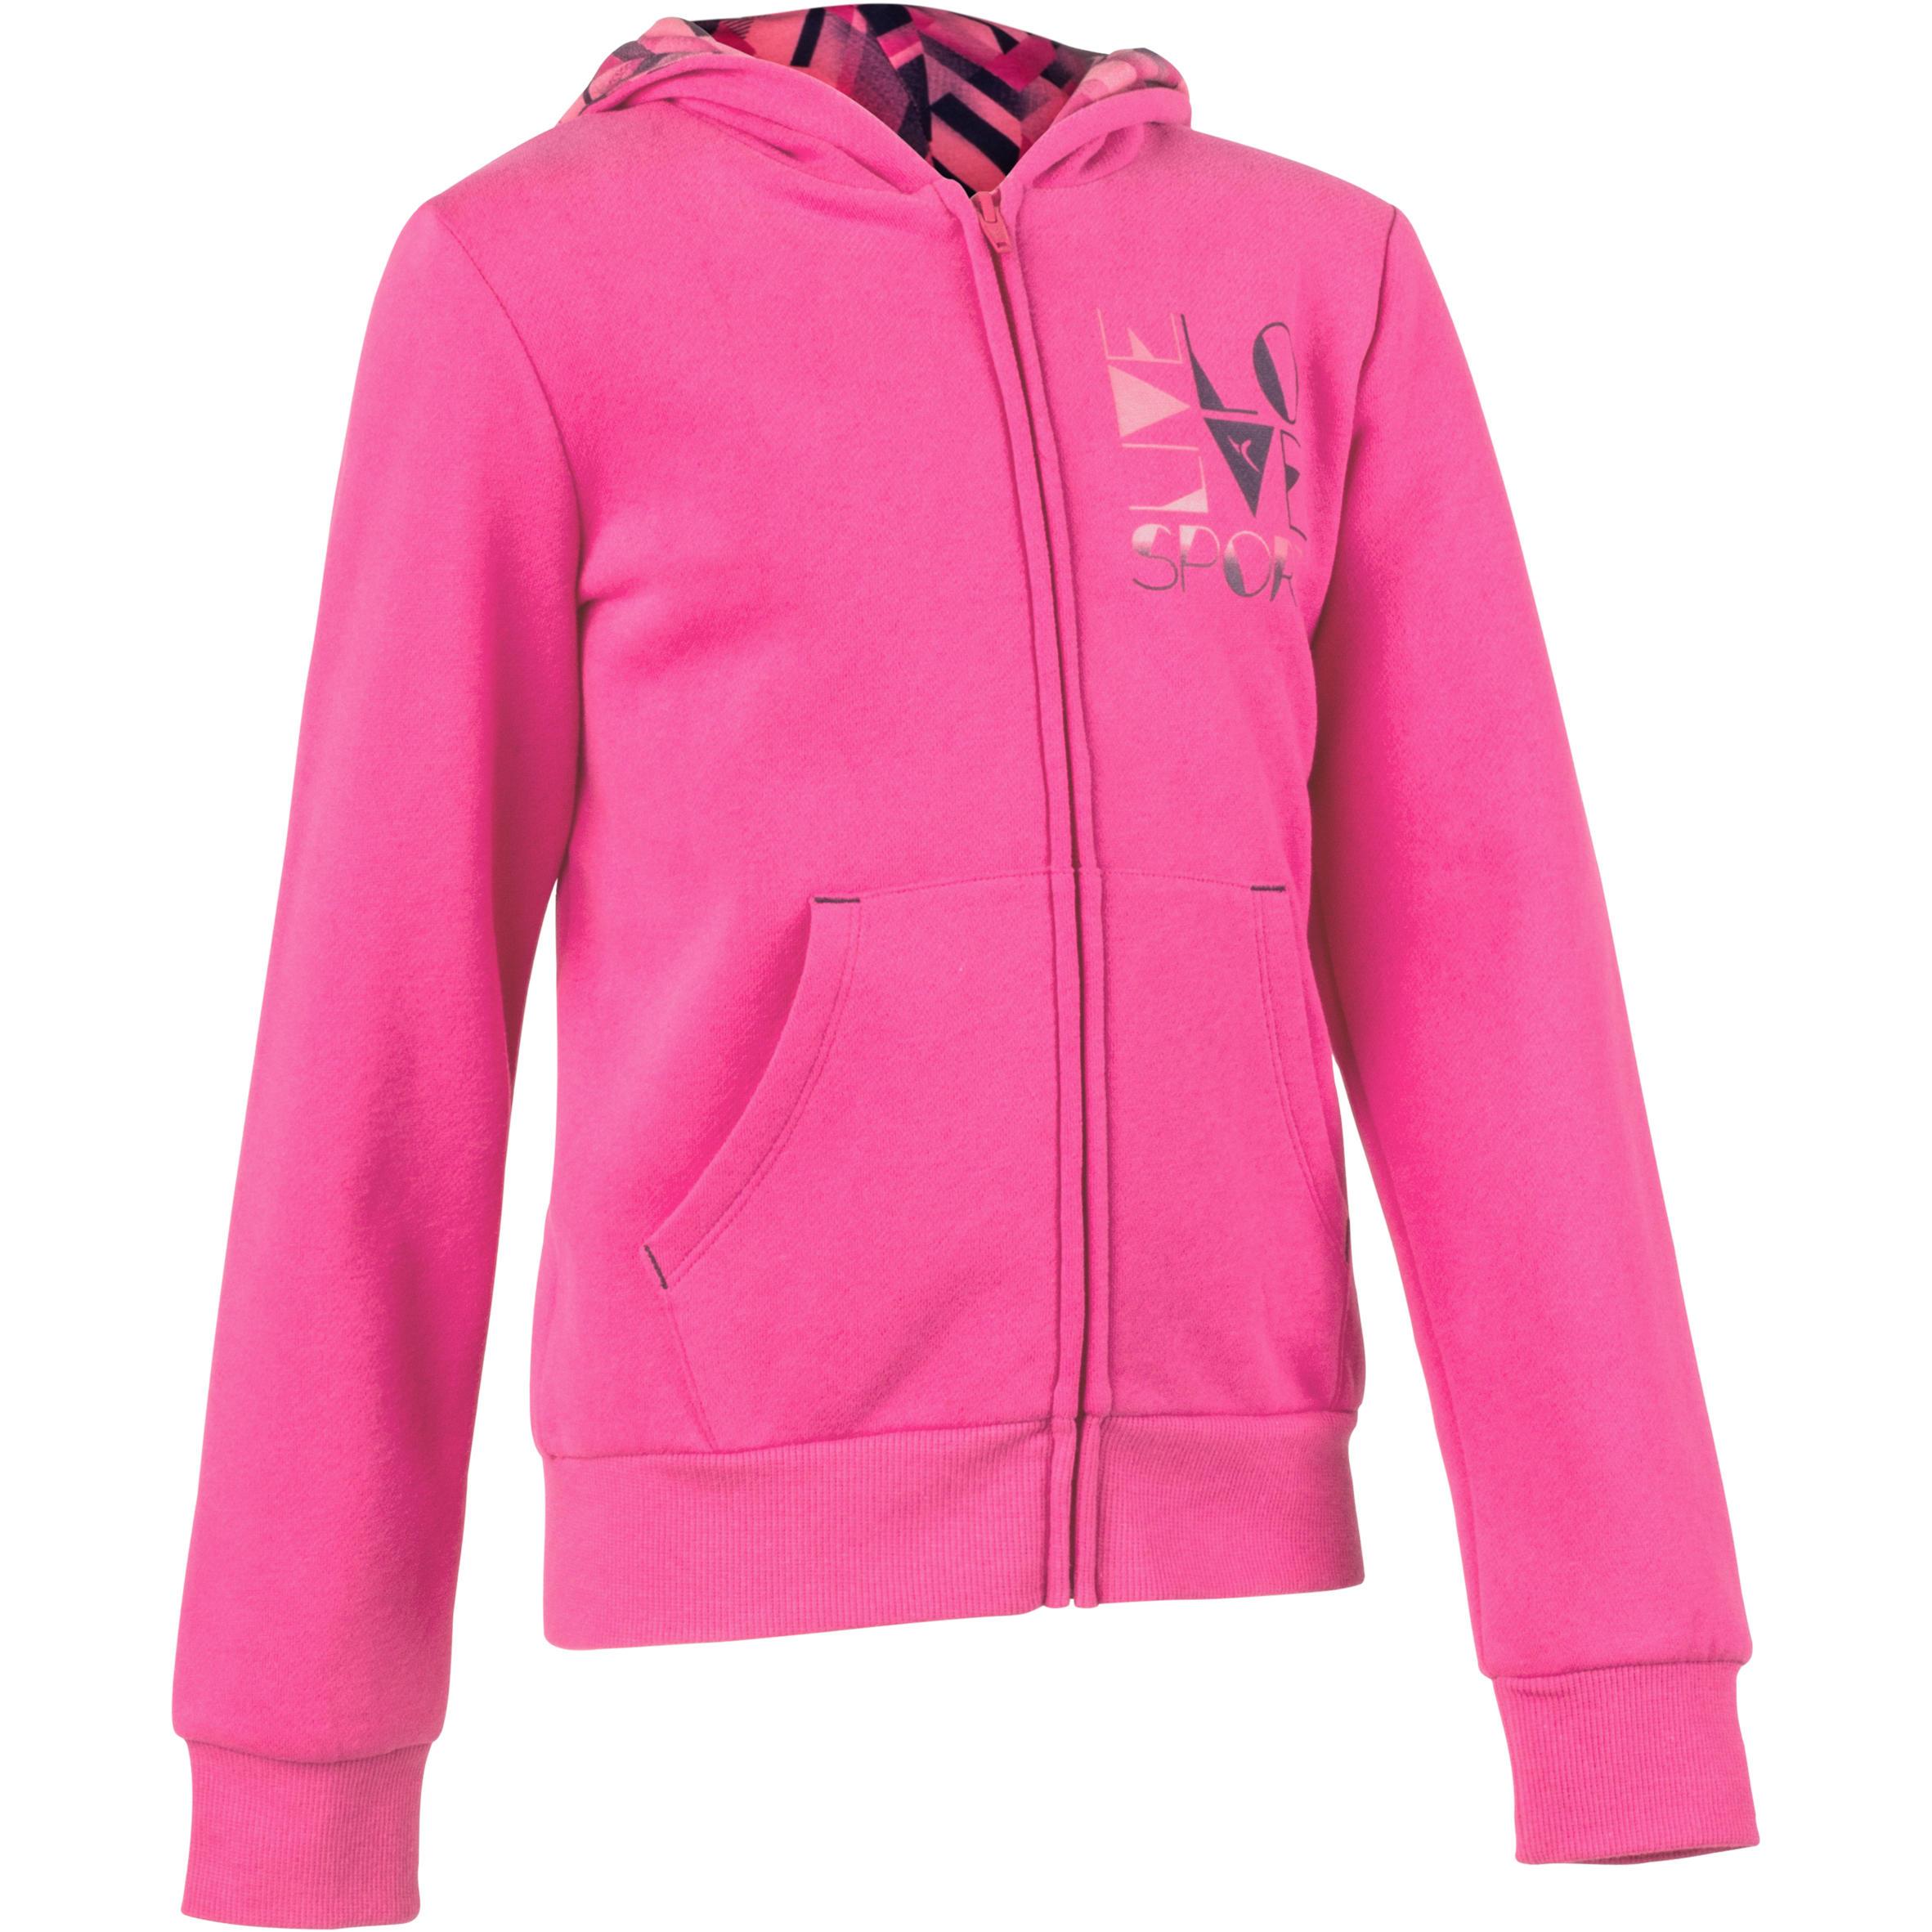 Chamarra 500 gimnasia niña capucha estampado rosa